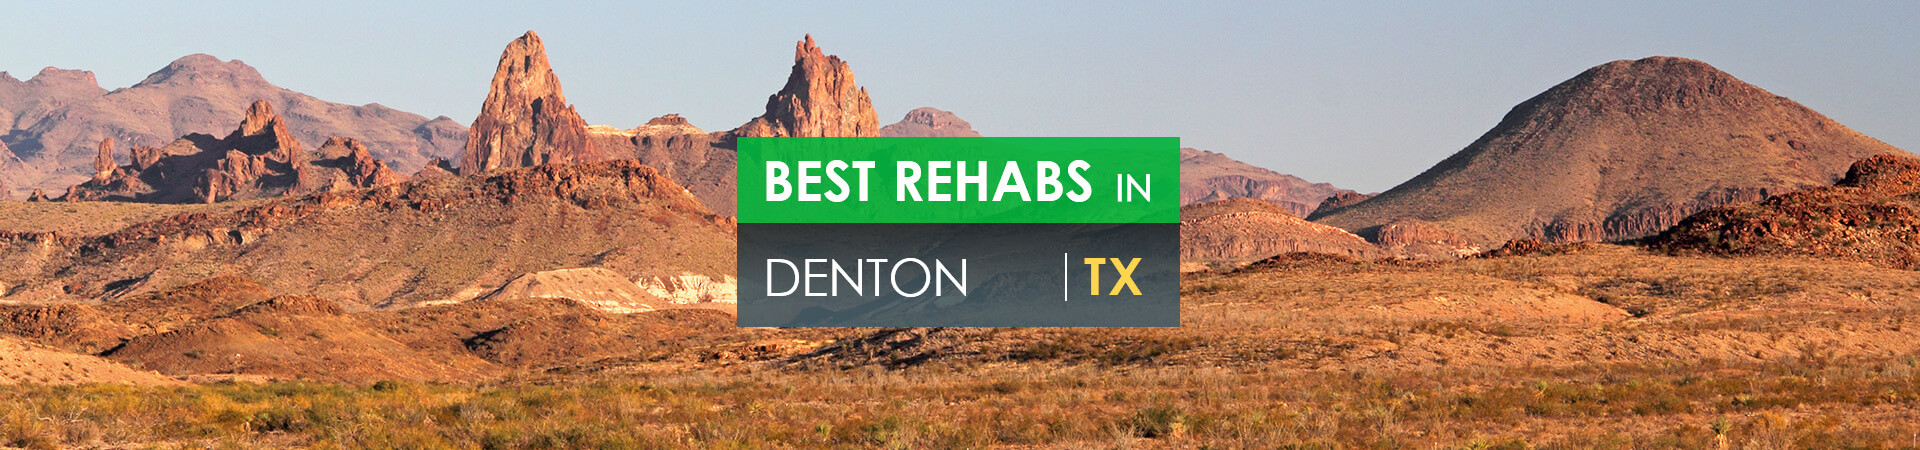 Best rehabs in Denton, TX